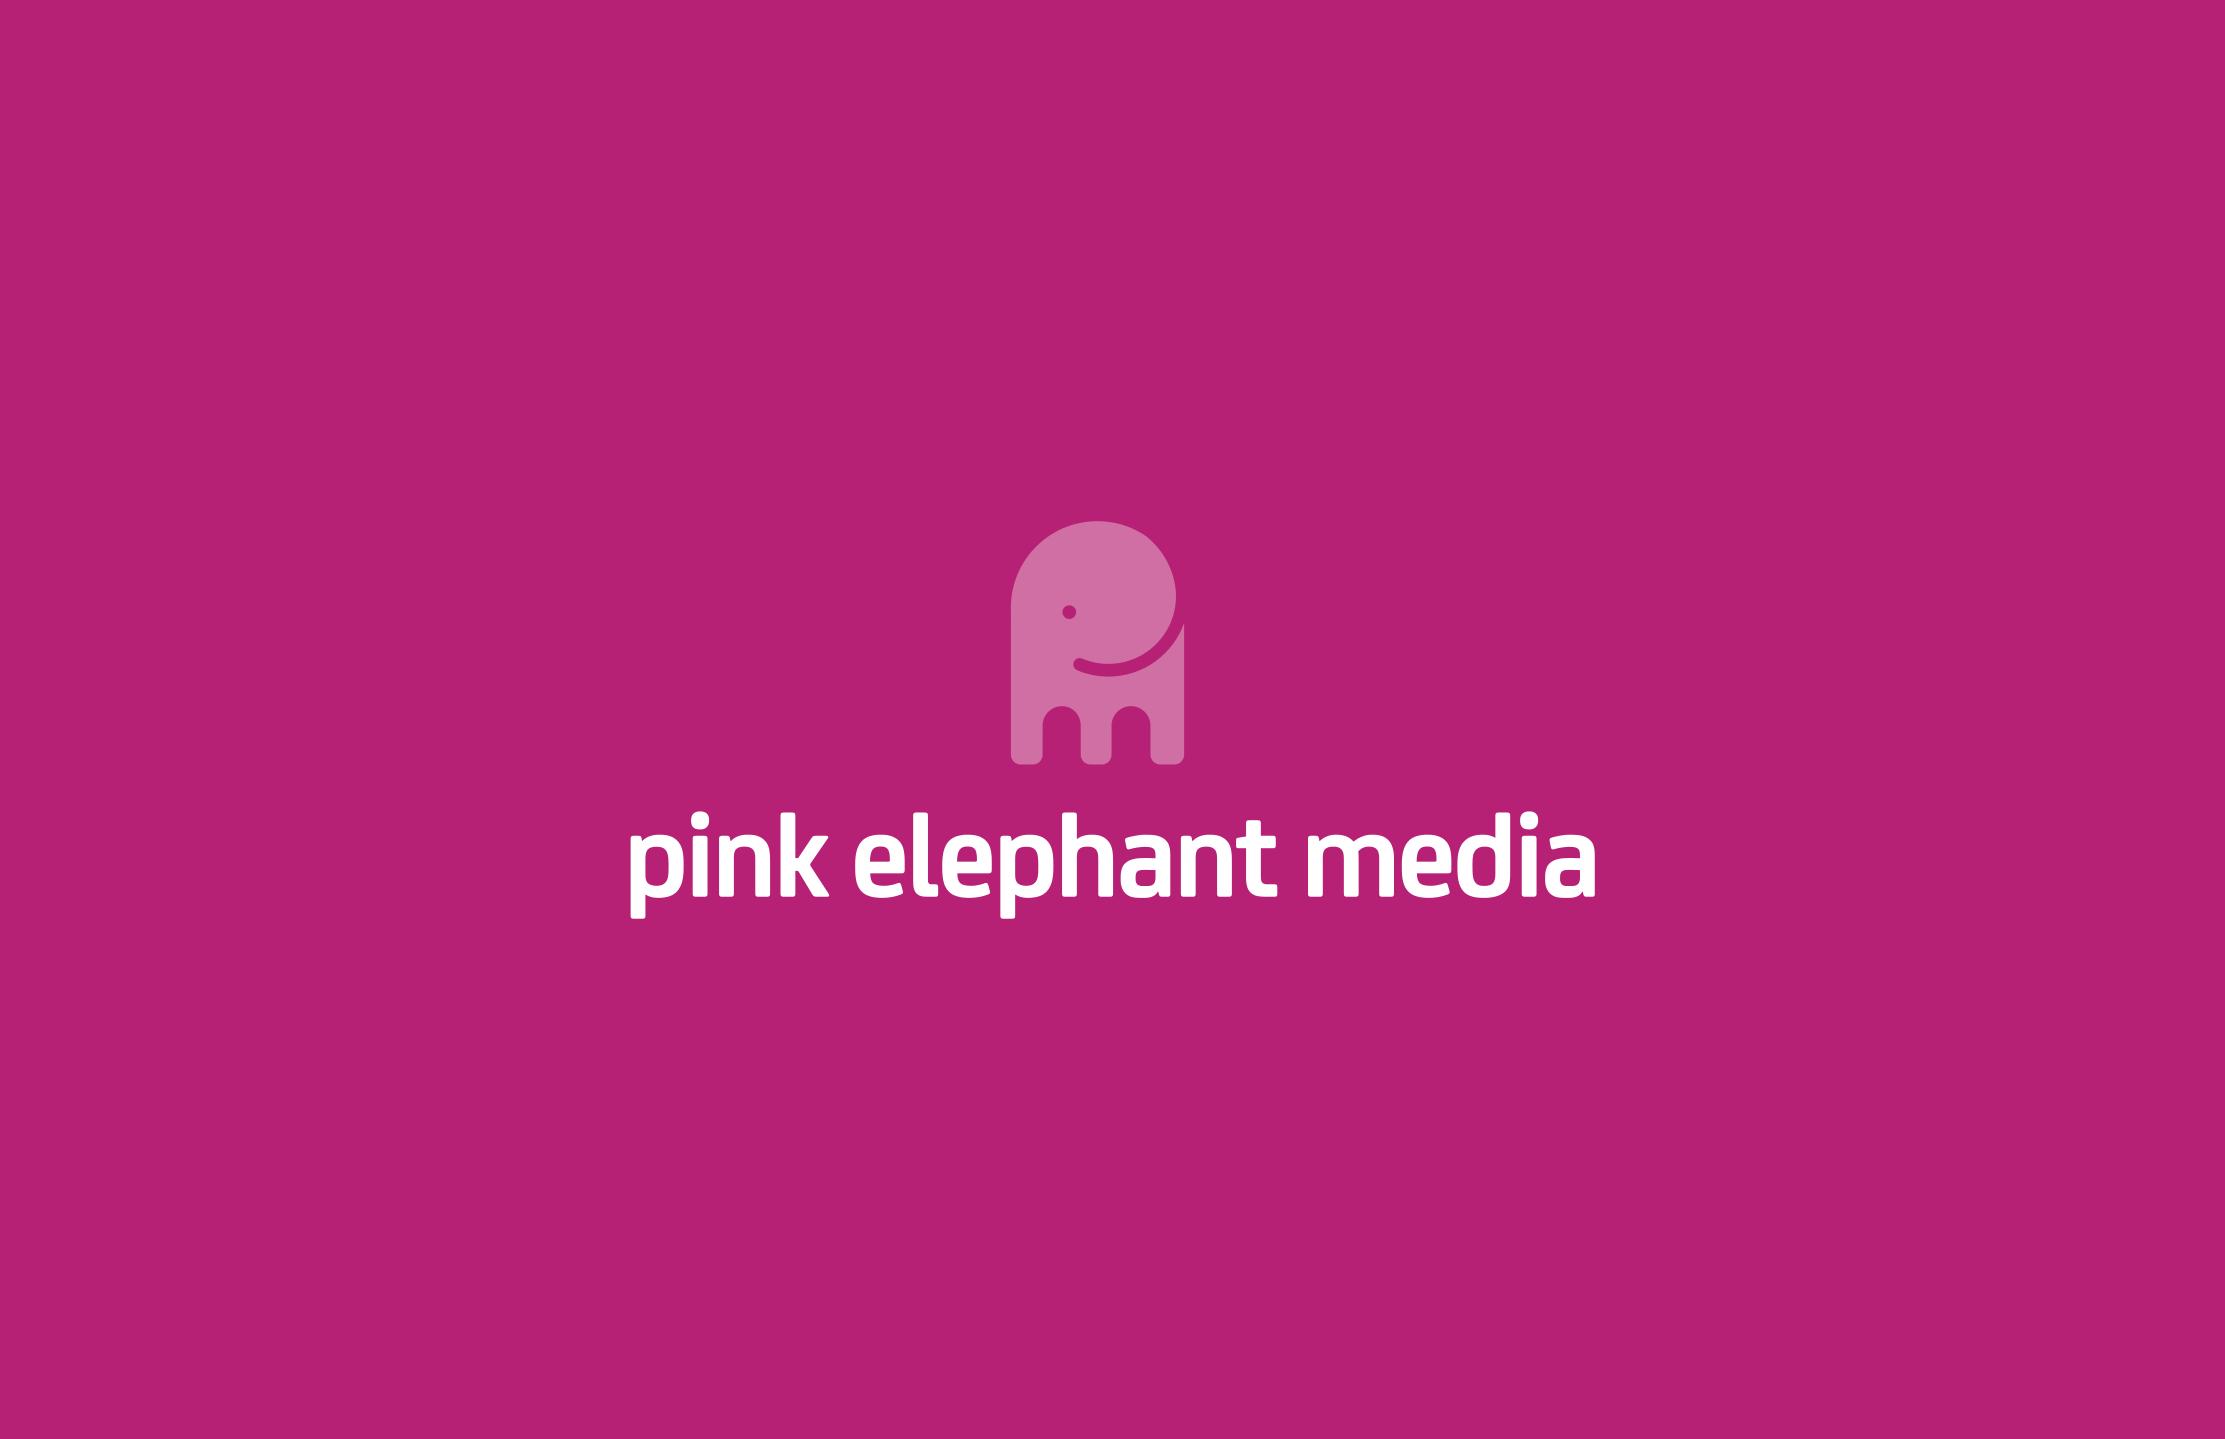 pink elephant media digital marketing